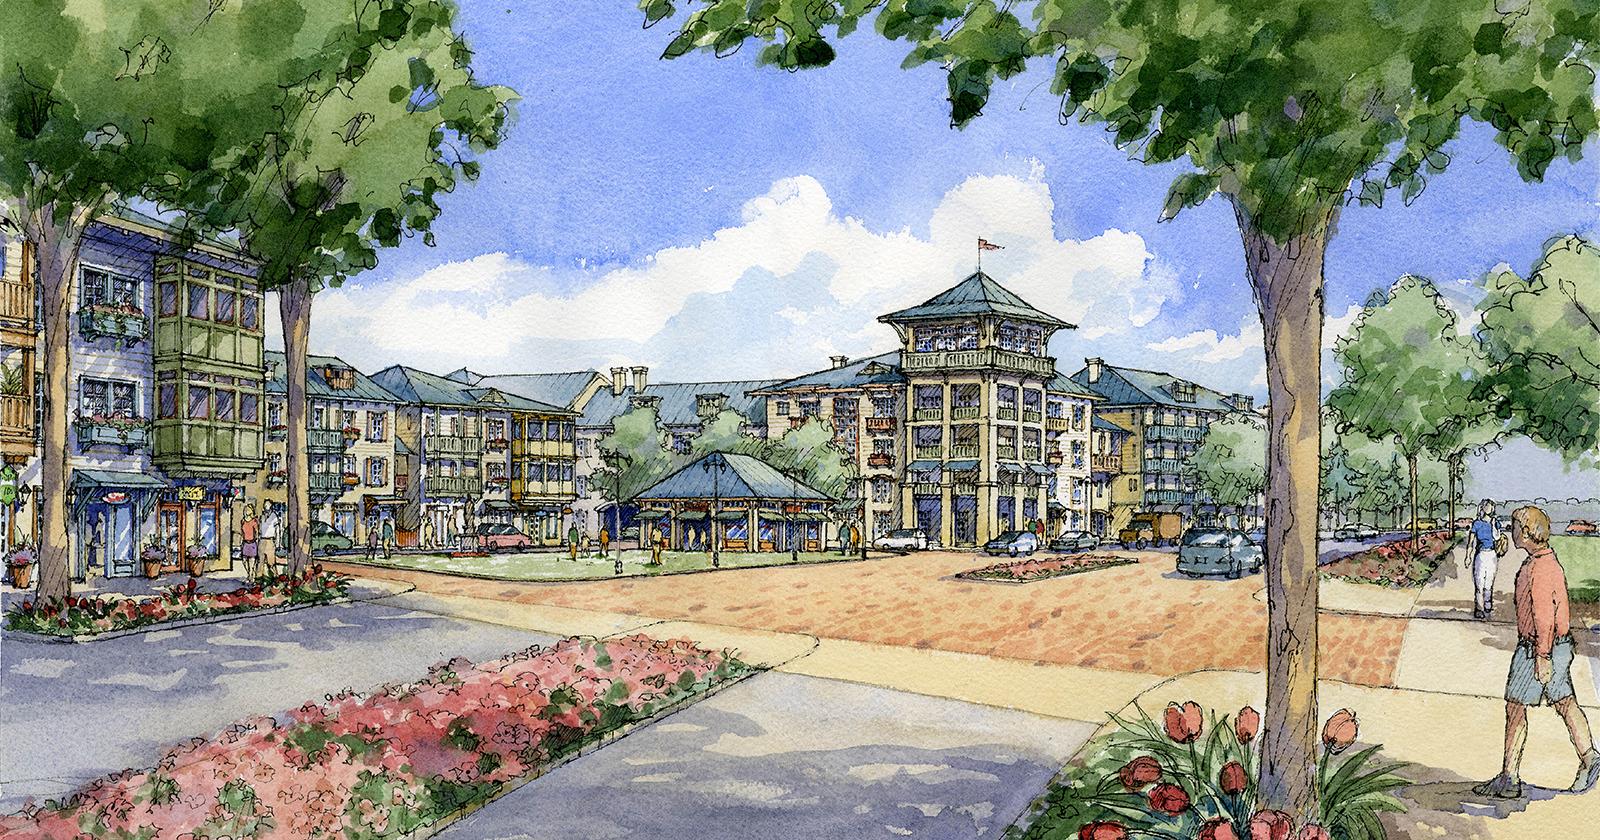 Waterfront Community Restoration, Virginia Beach, VA